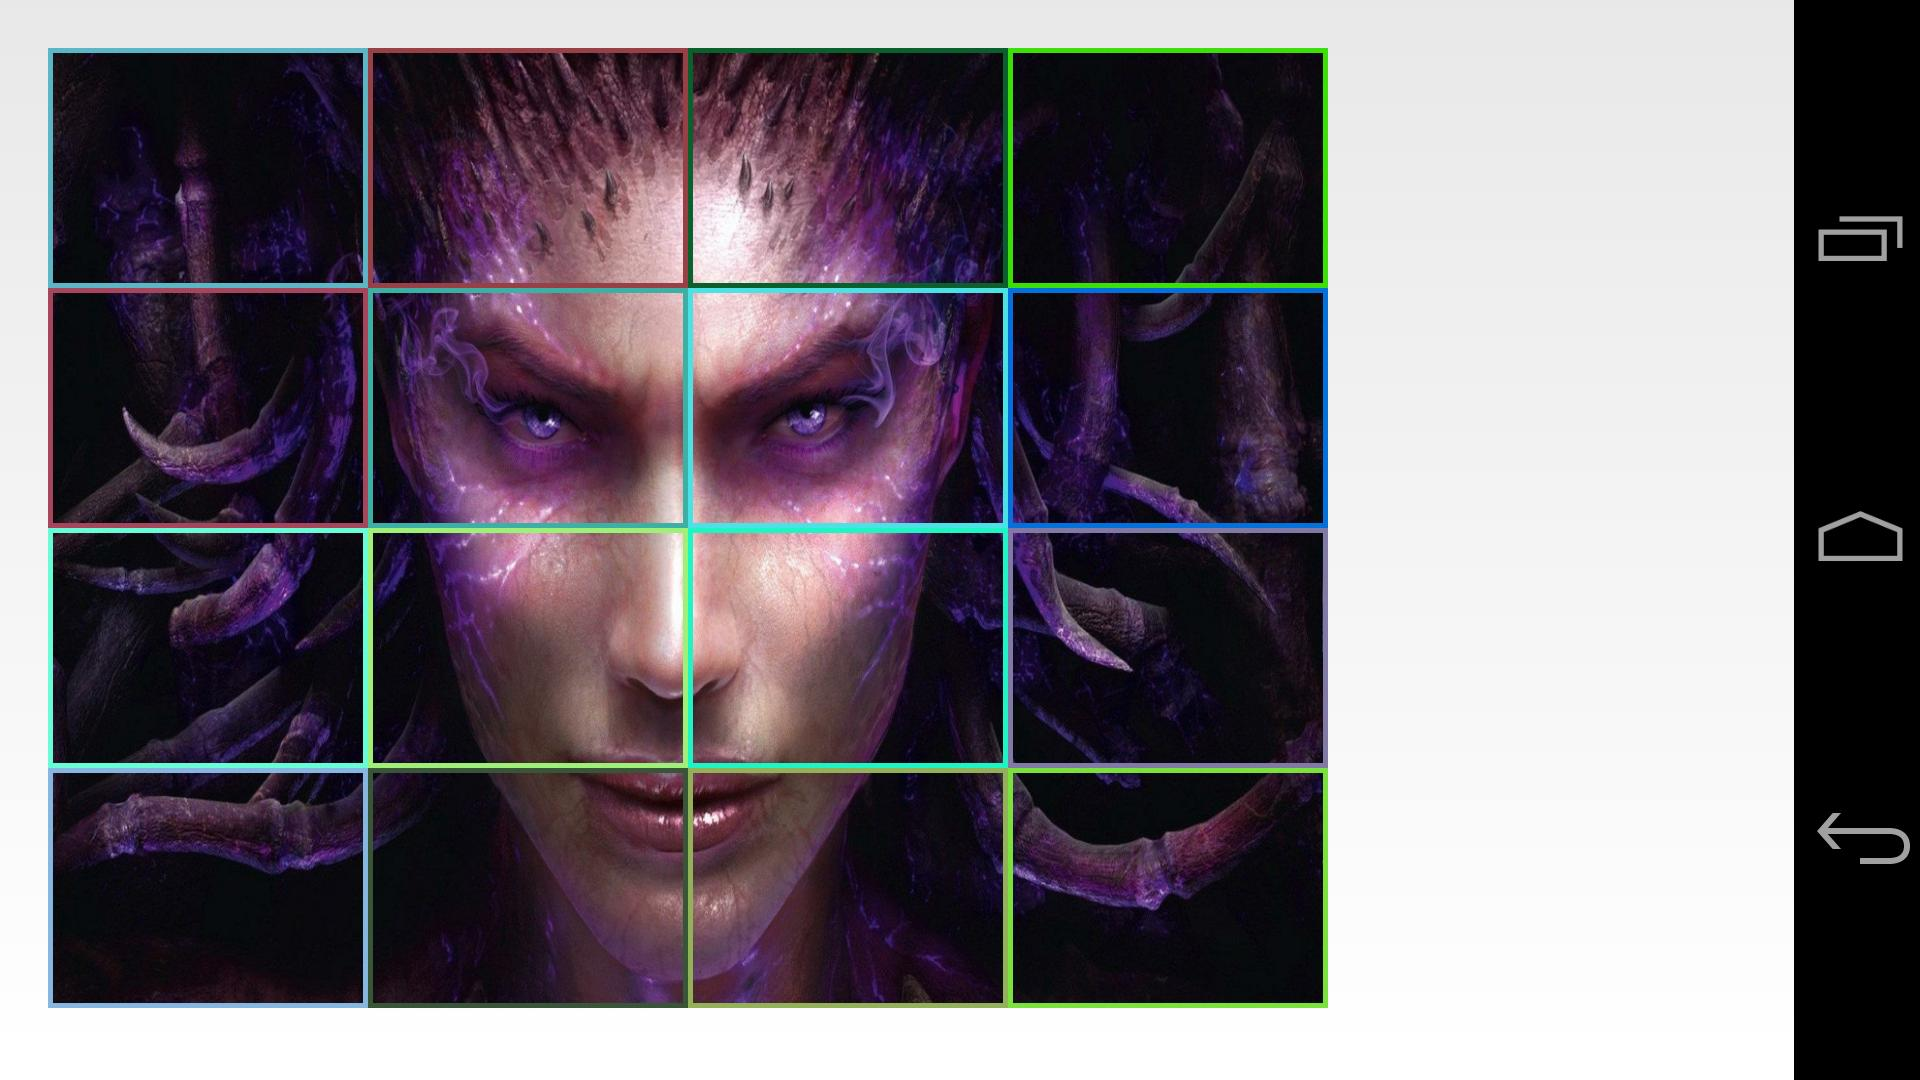 Android-1/week1/1-PuzzleGame at master · HackBulgaria